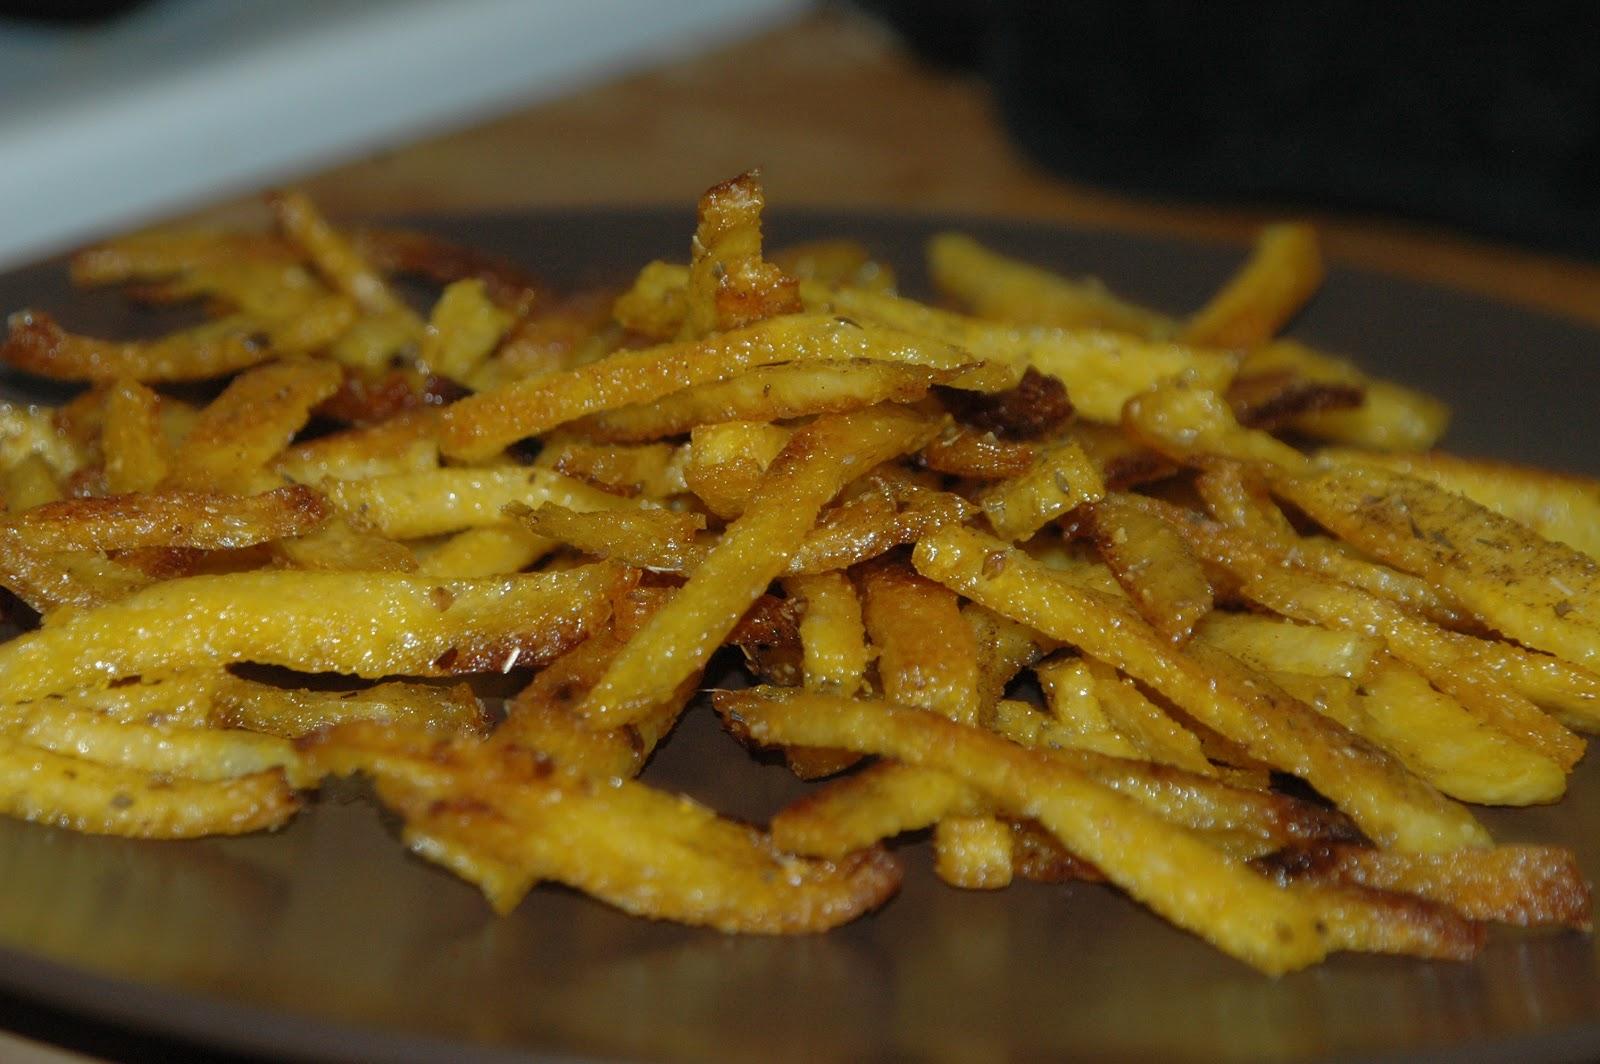 Emily's Cruelty Free Kitchen: Baked Polenta Fries